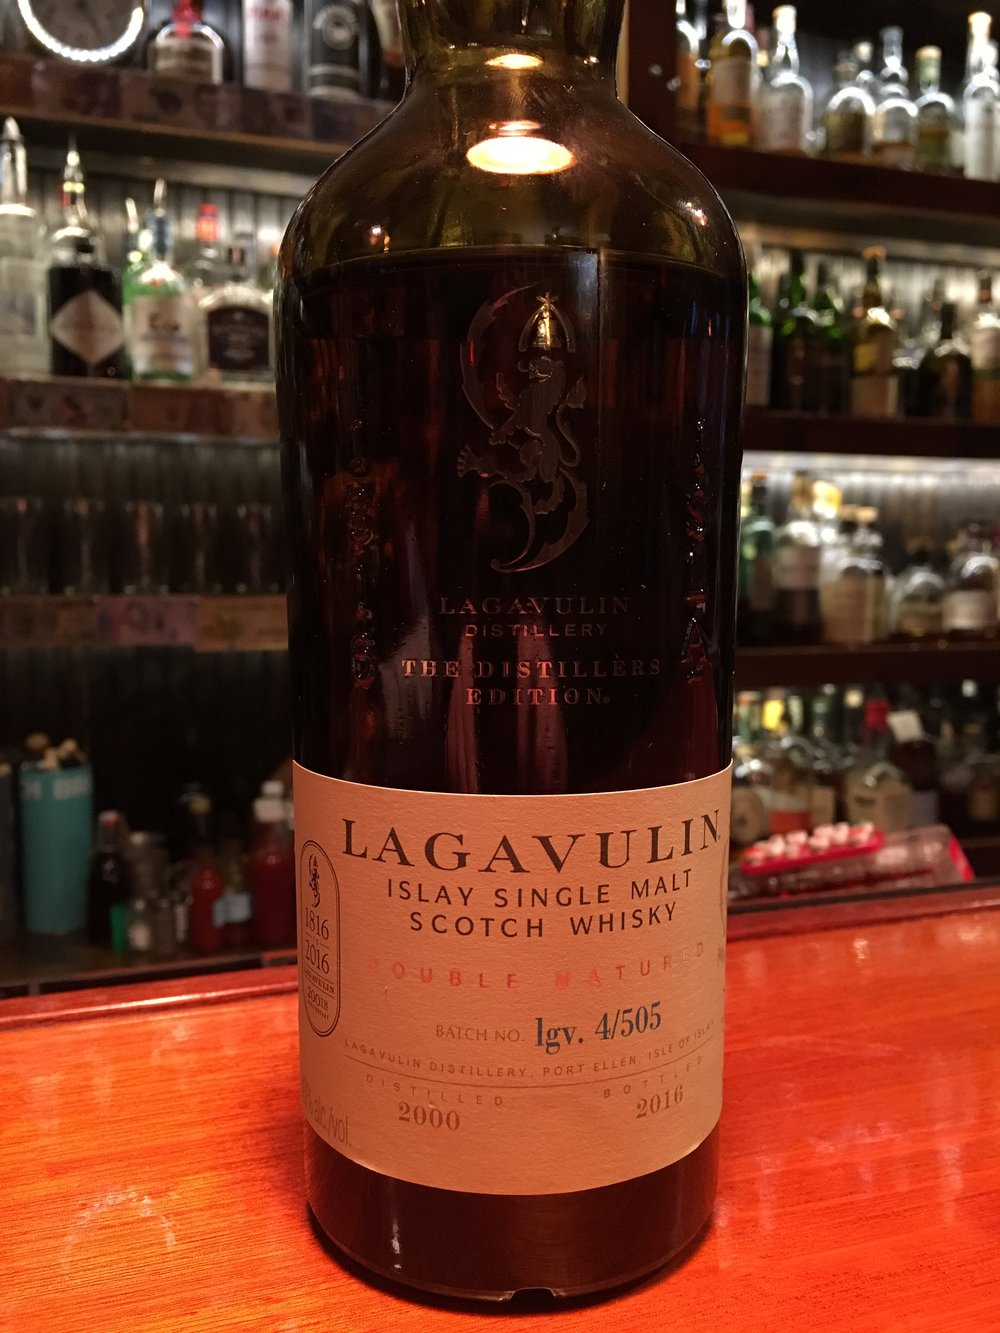 16 Year Old | 43% ABV - Distillery | Lagavulin